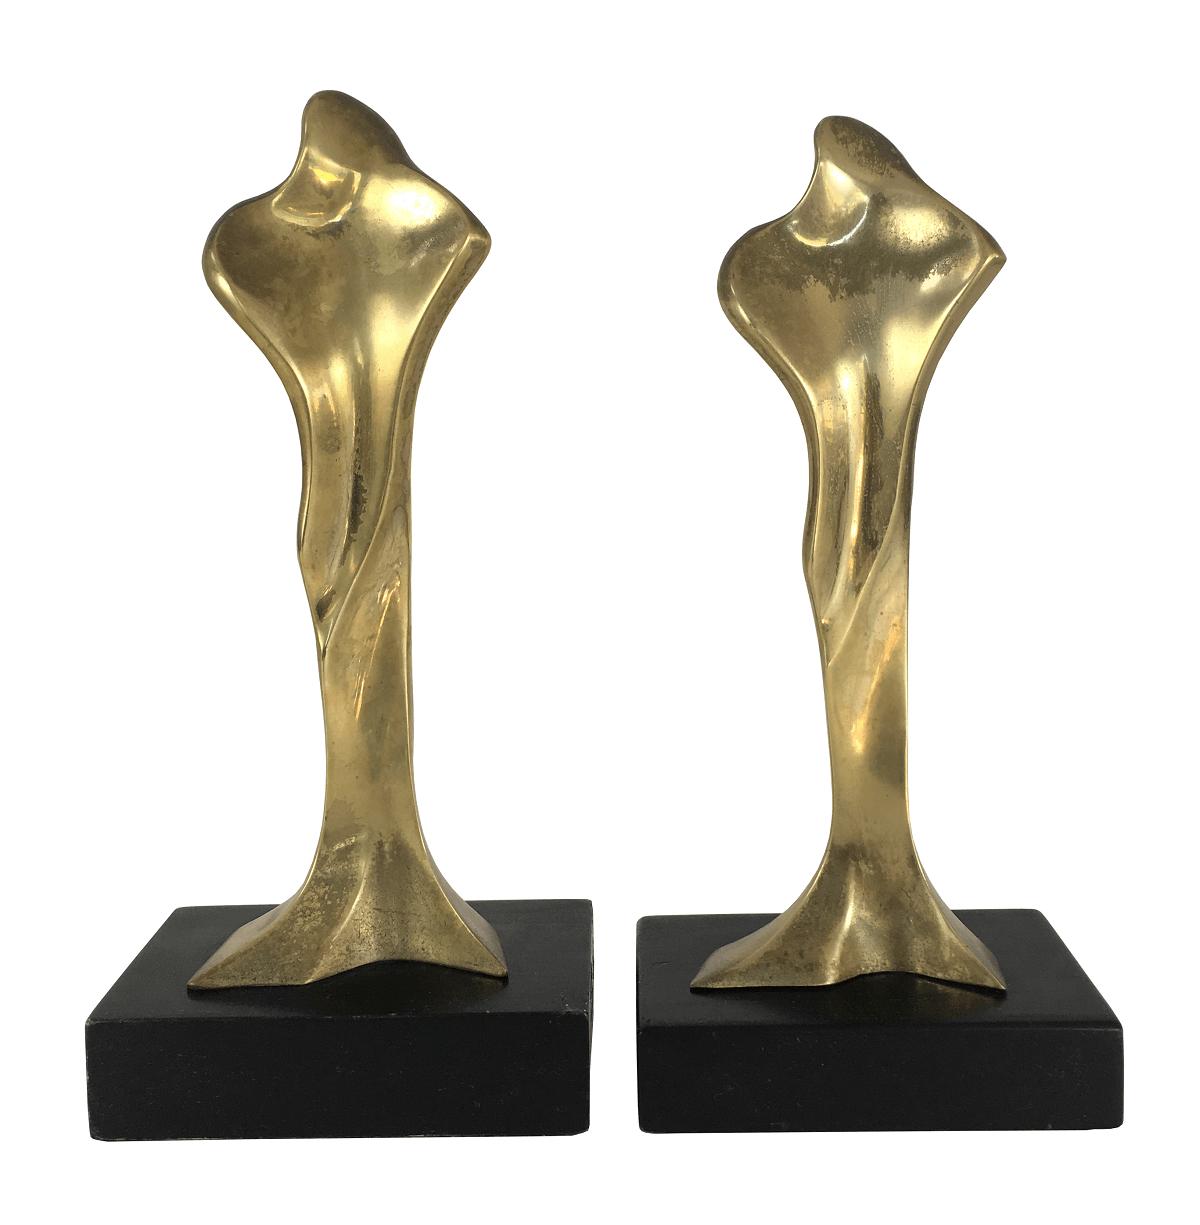 Antiga Escultura Em Bronze Assinada Spalletti Par